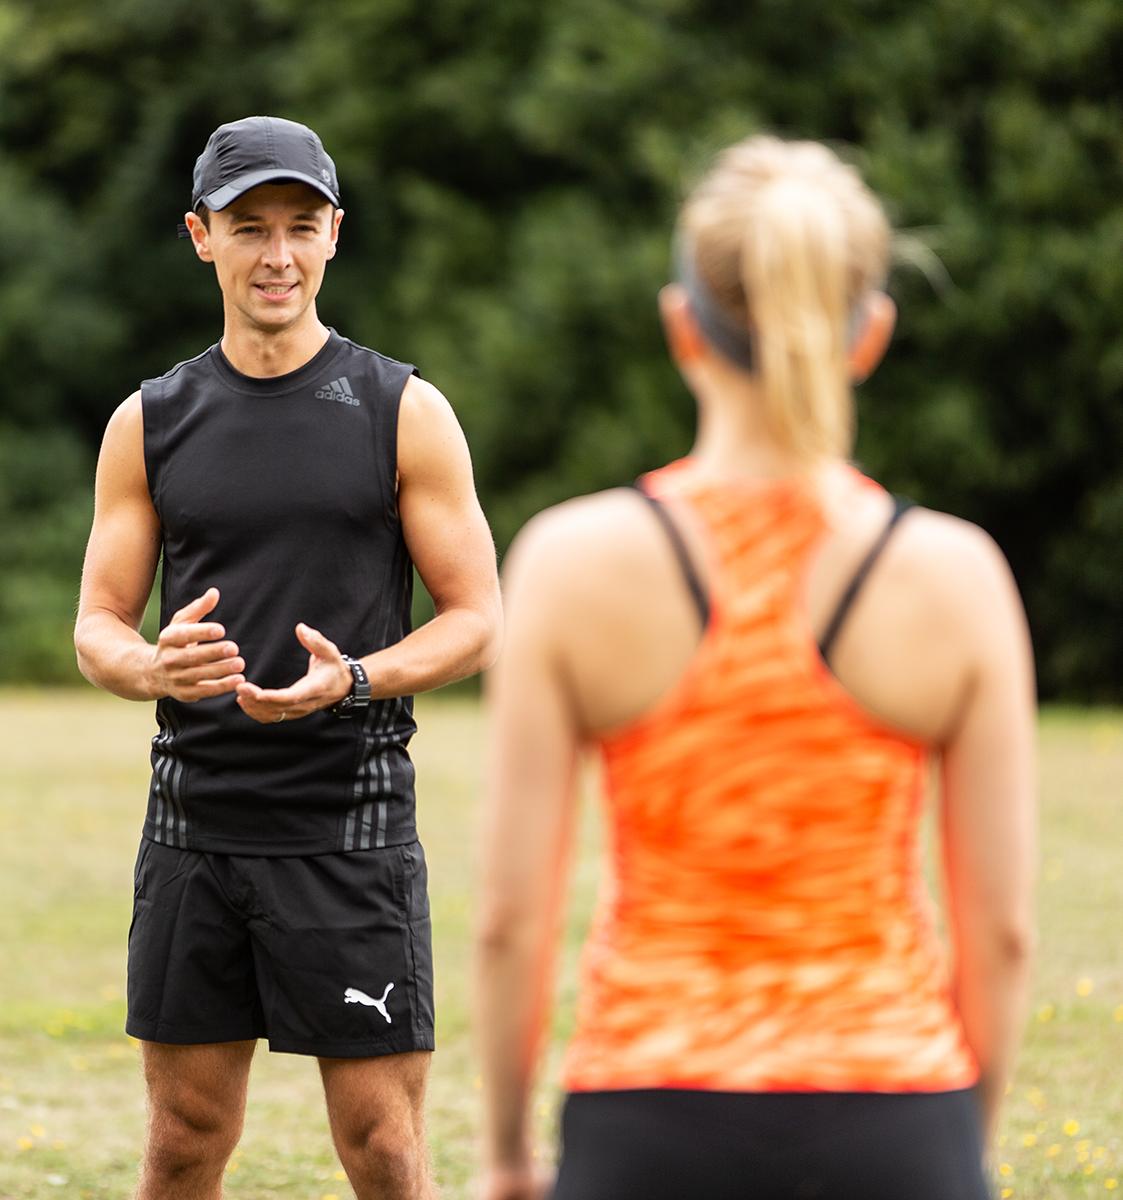 Chislehurst Fitness - Personal Training